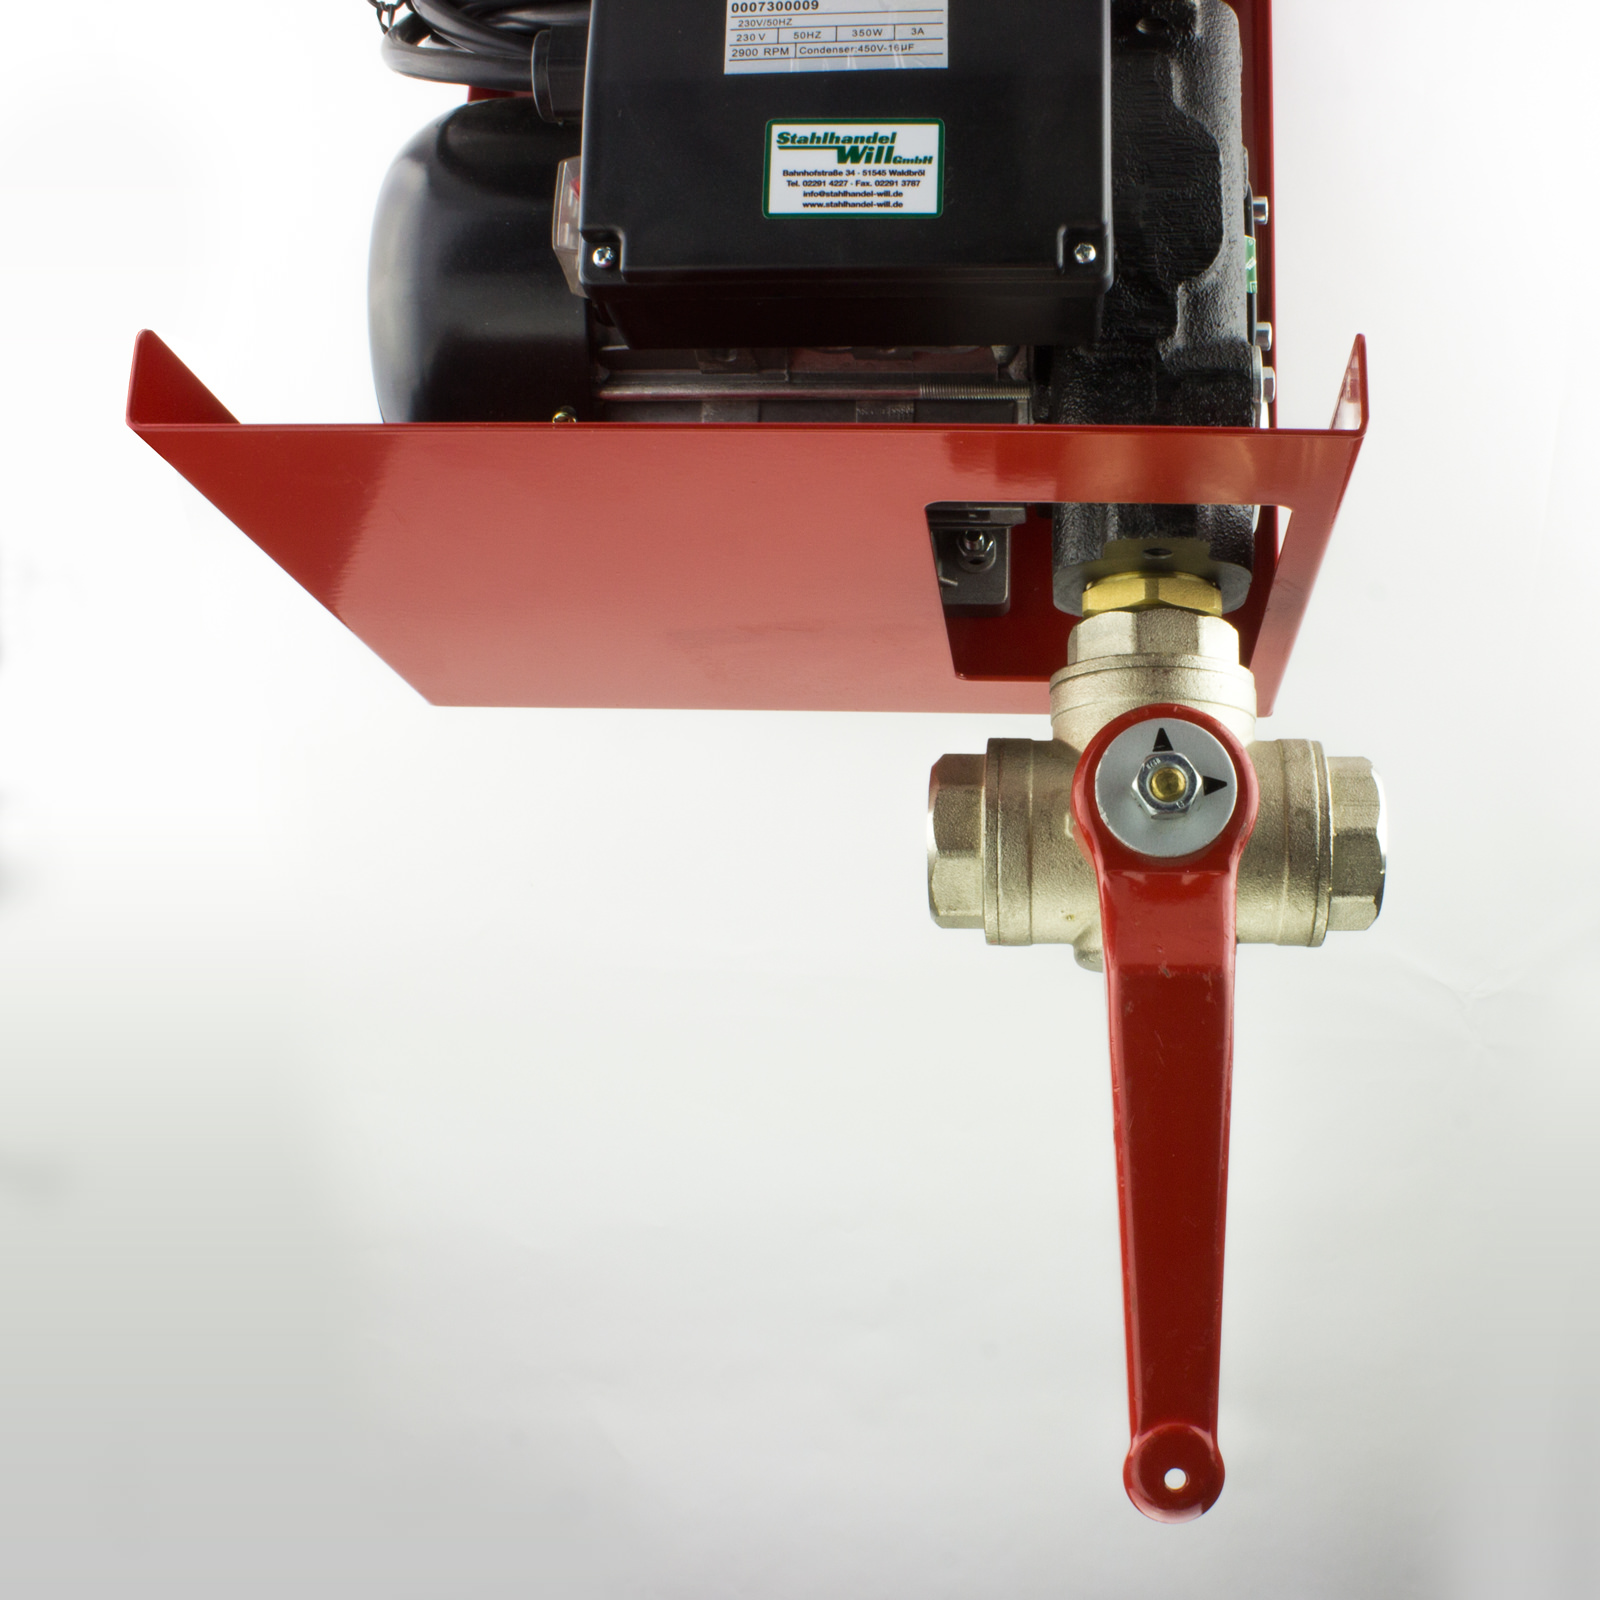 1stk diesel pumpe tankstelle mit kugelventil dieselpumpe. Black Bedroom Furniture Sets. Home Design Ideas